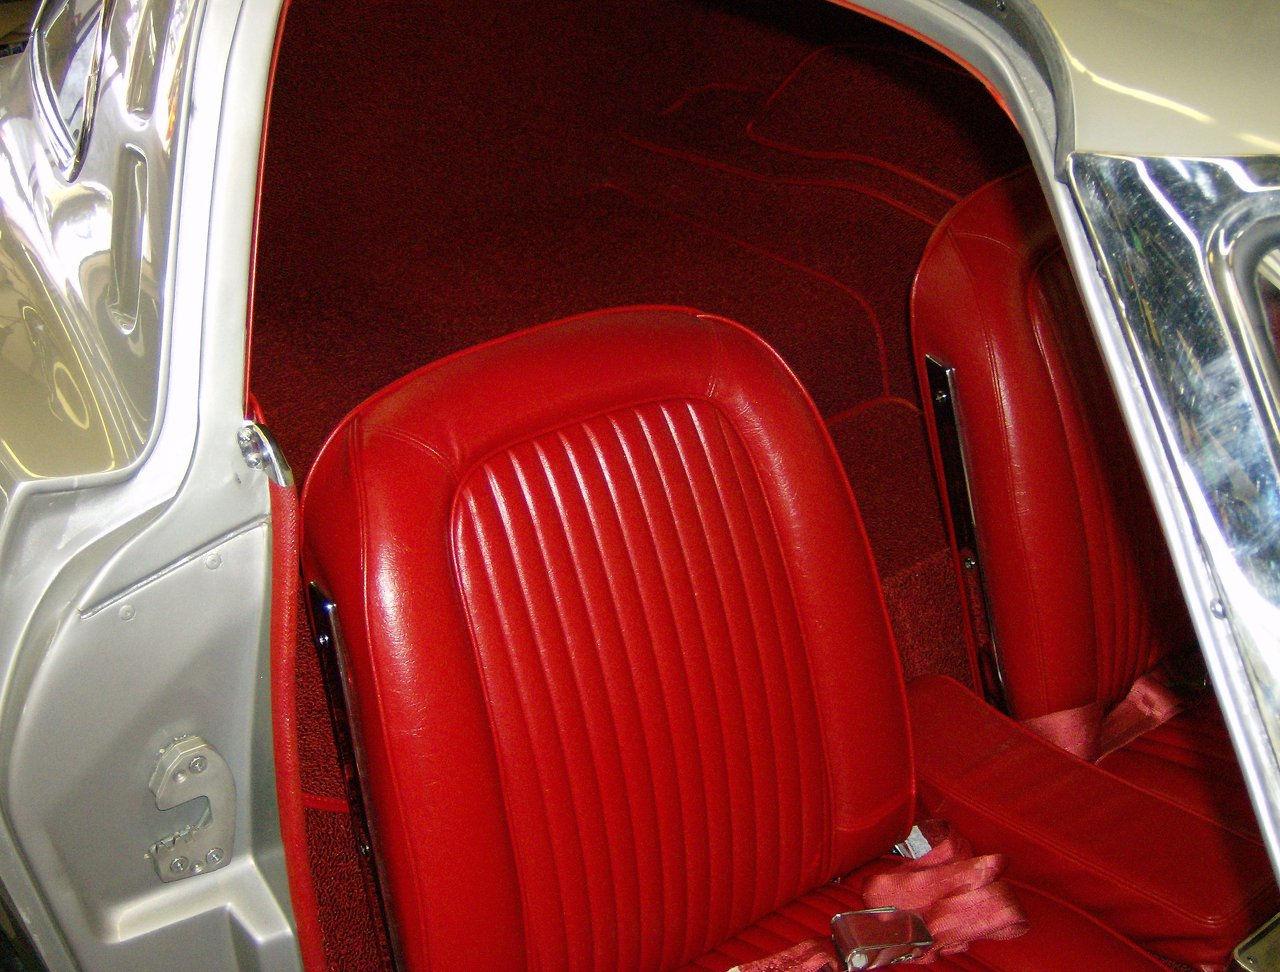 dee trim shop auto top and auto interior specialists texas interiors. Black Bedroom Furniture Sets. Home Design Ideas